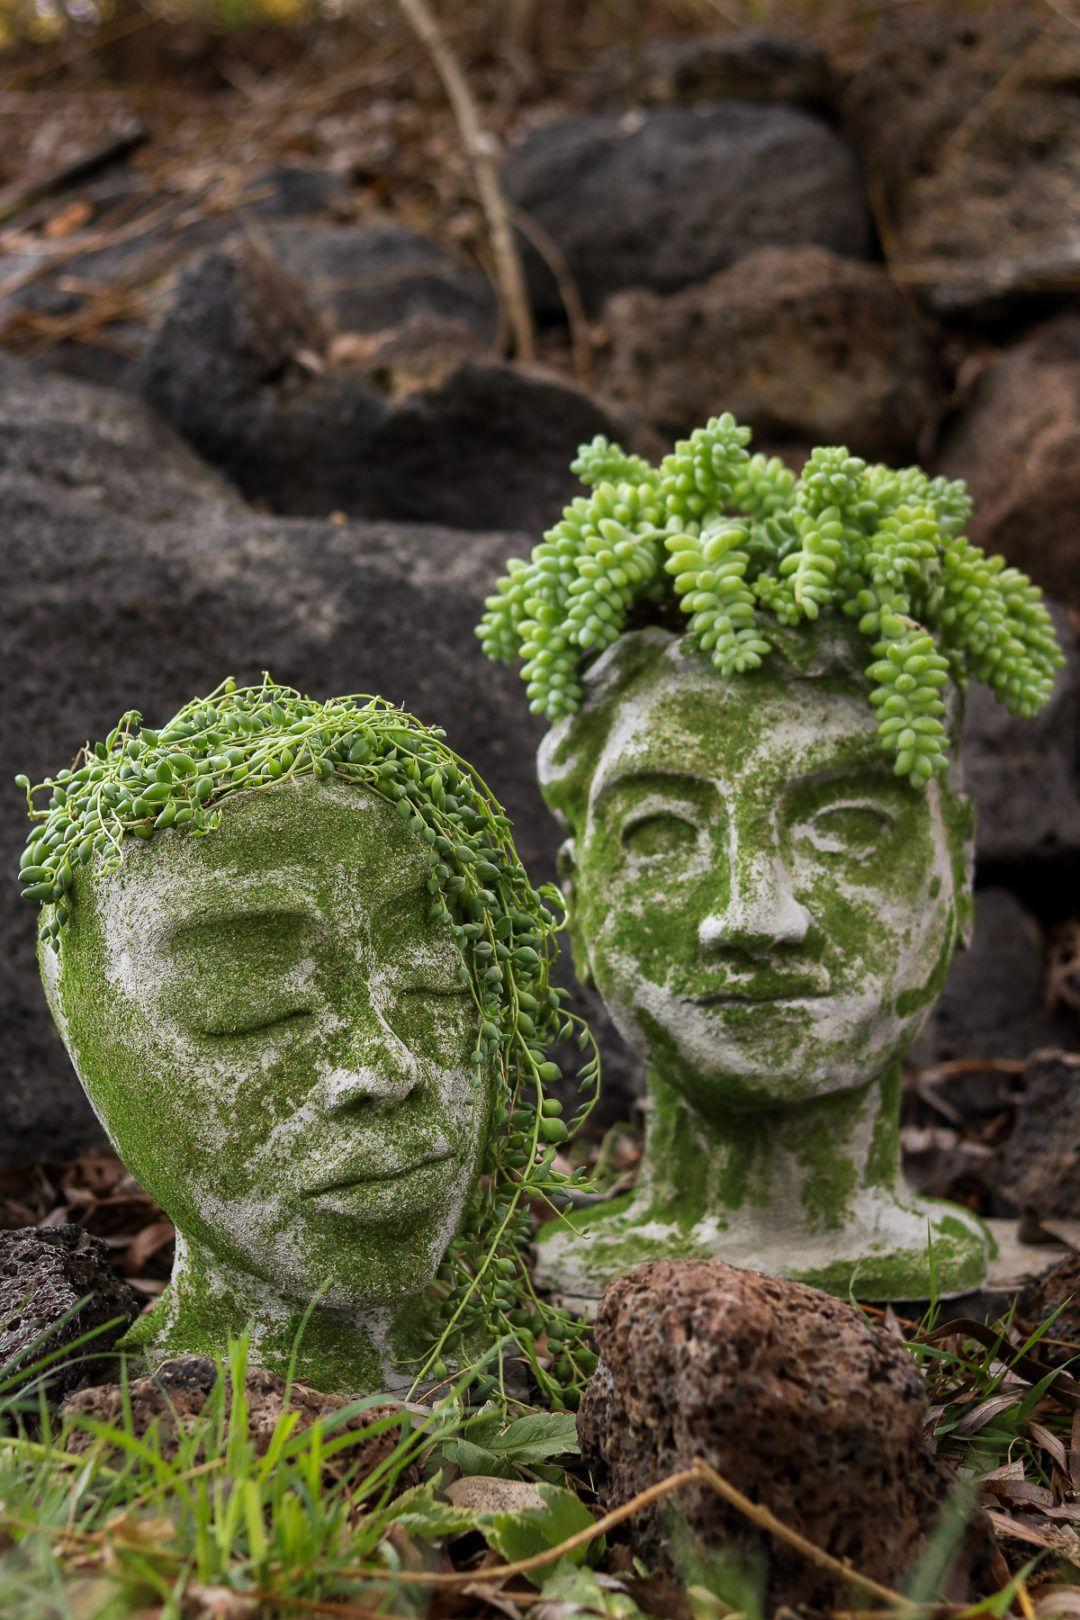 Diy head planter using concrete garden diys with images